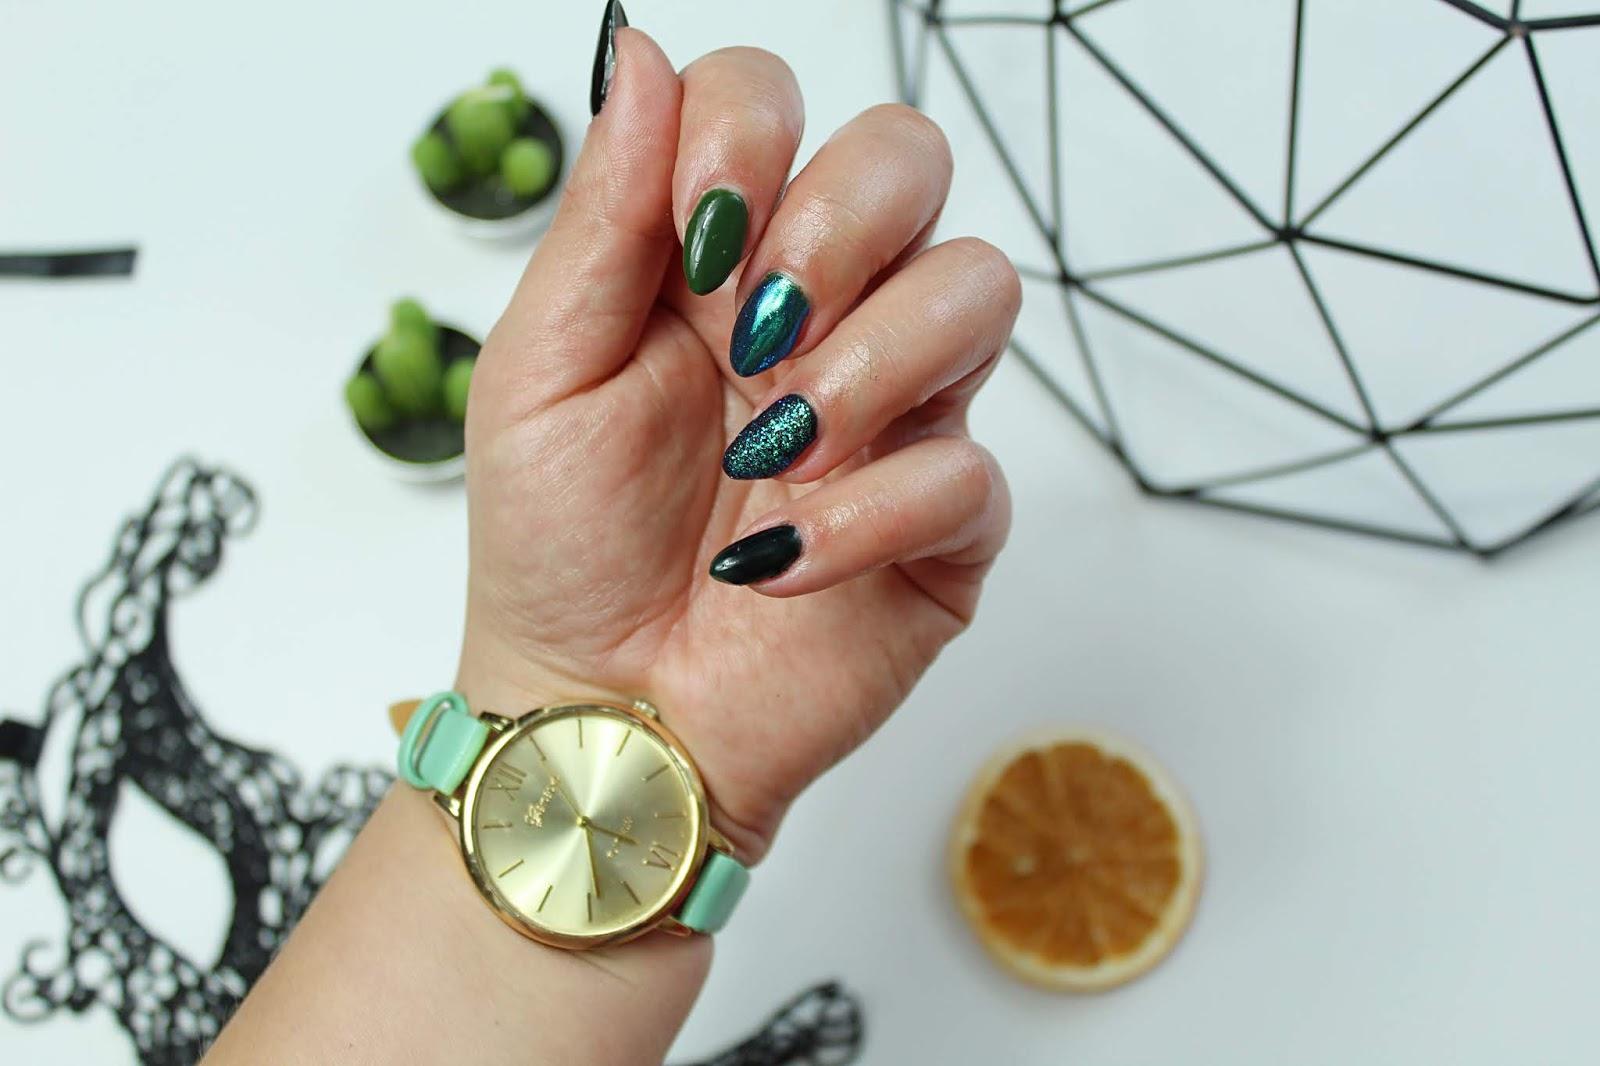 lakiery hybrydowe nails company wild women i military&army, pyłki rainbow no1 i no3